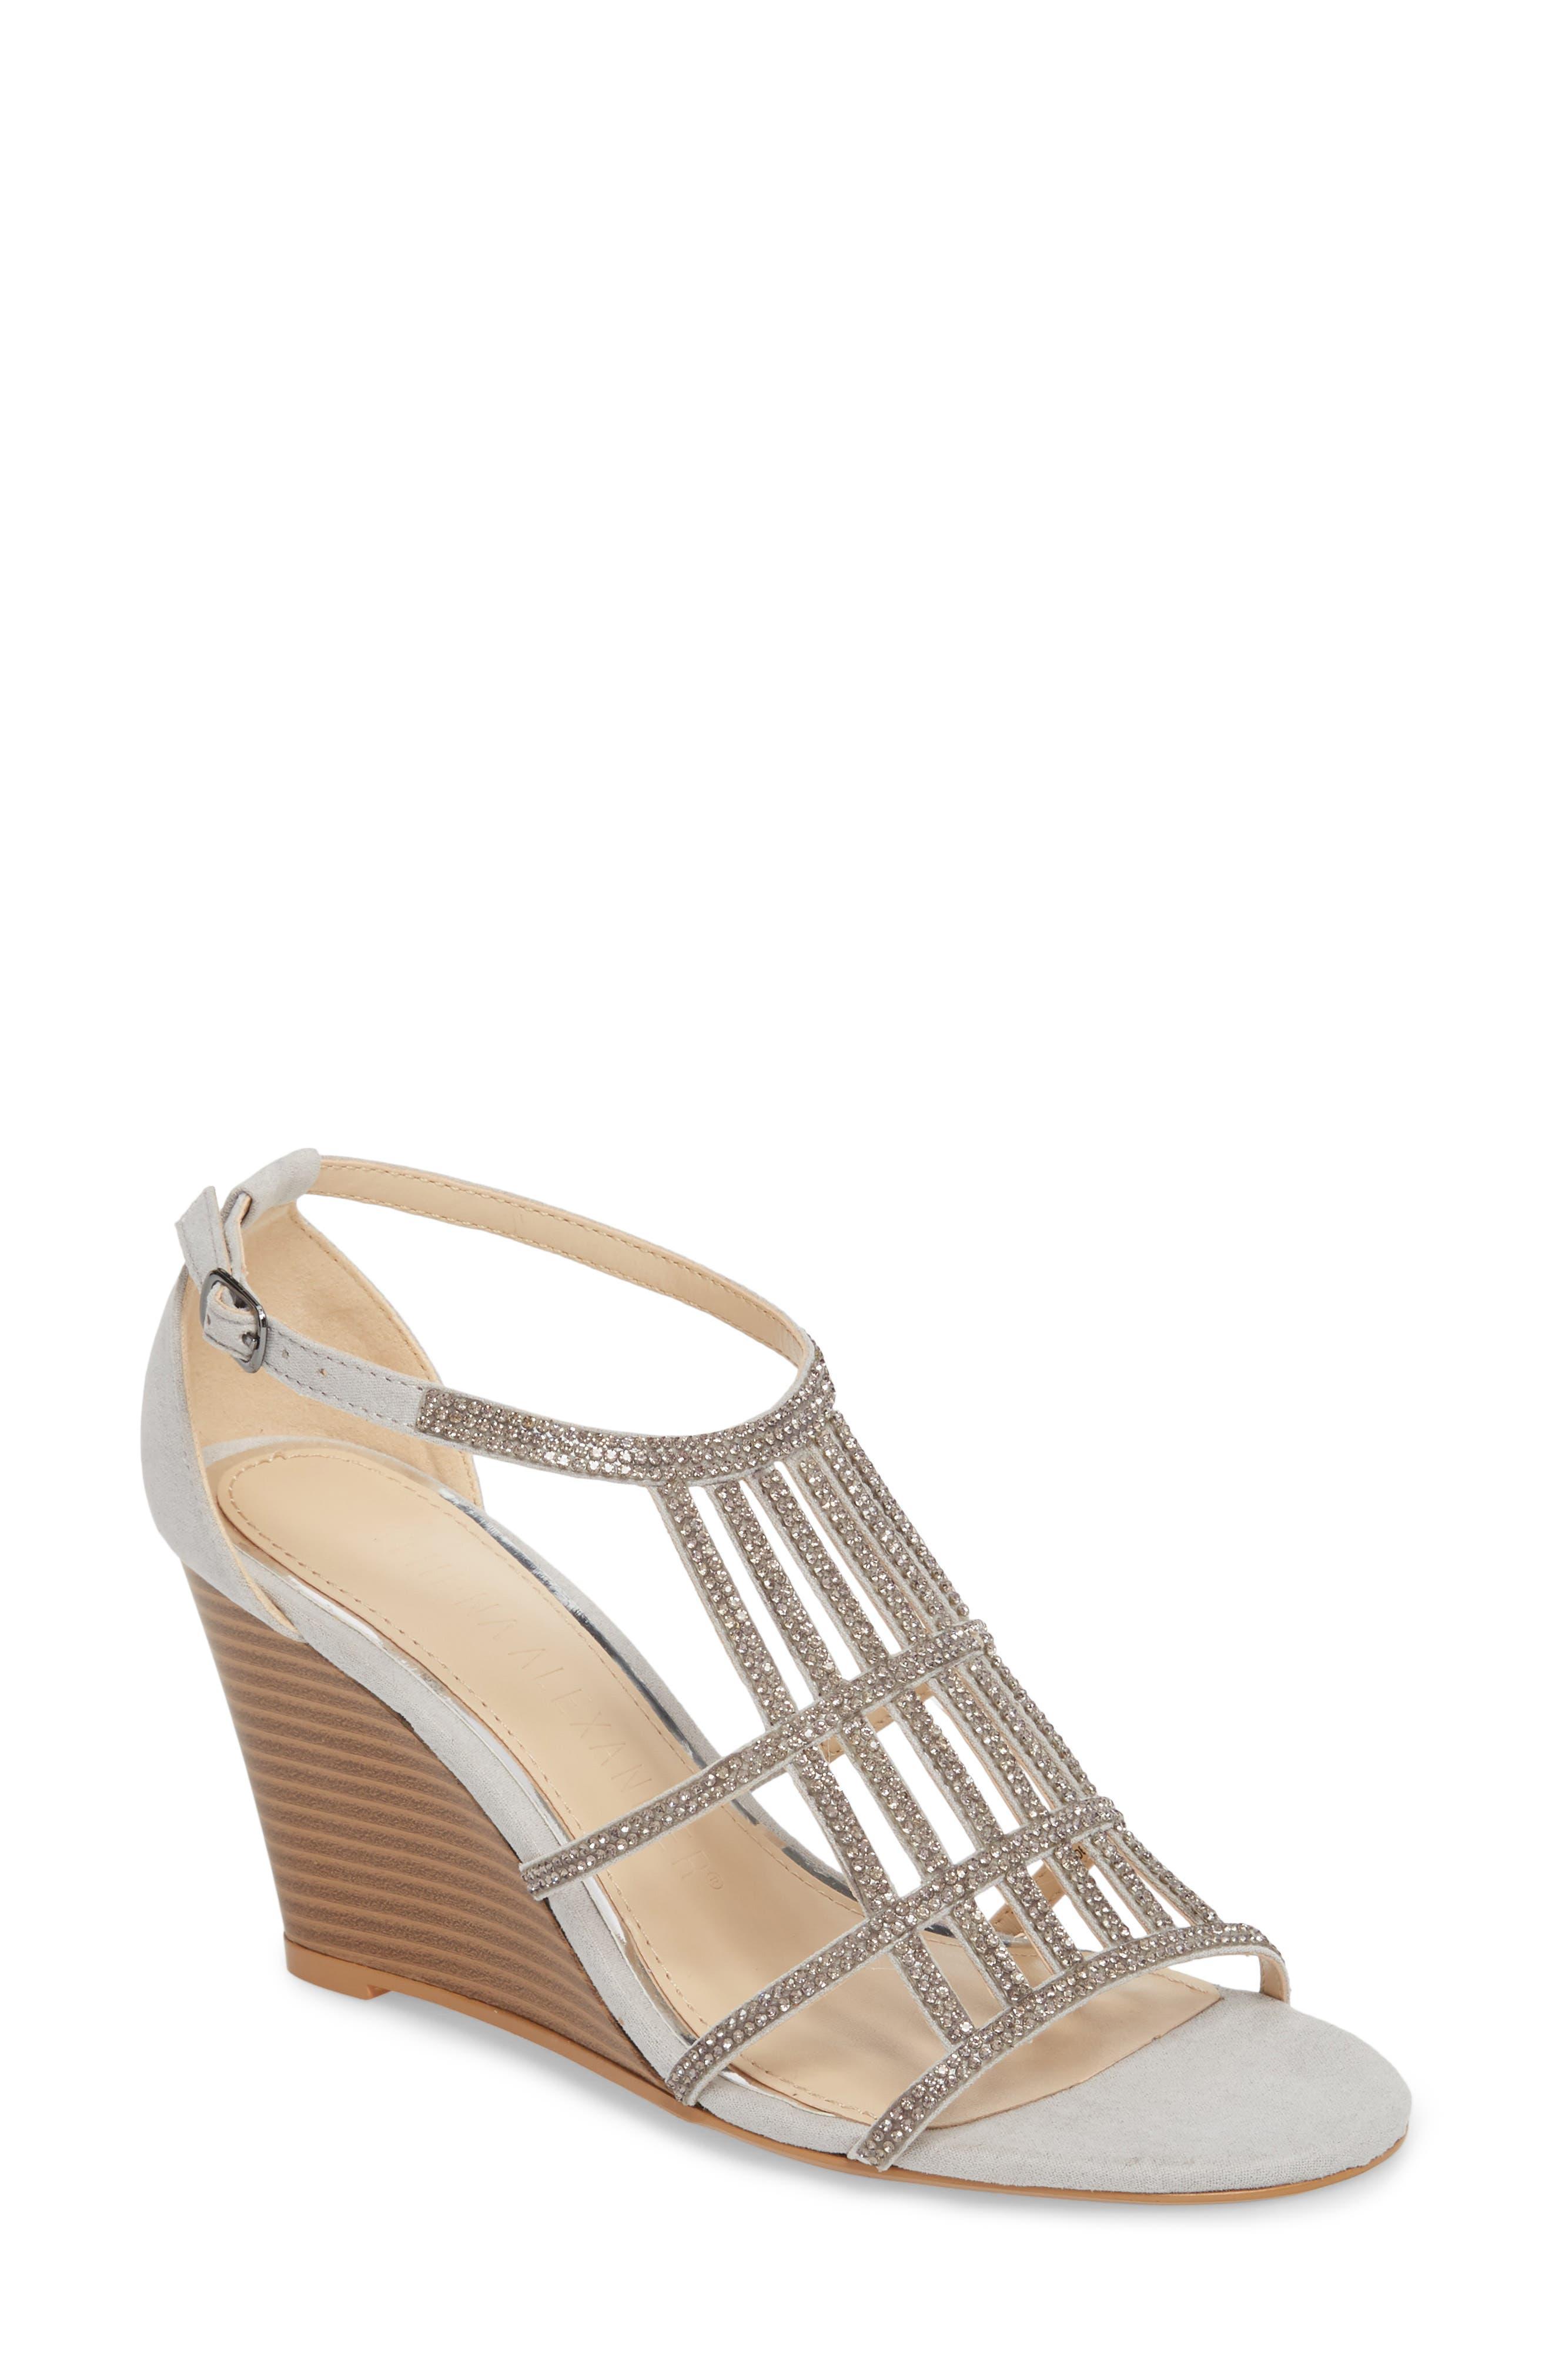 Hampton Crystal Embellished Wedge Sandal,                         Main,                         color, Grey Suede